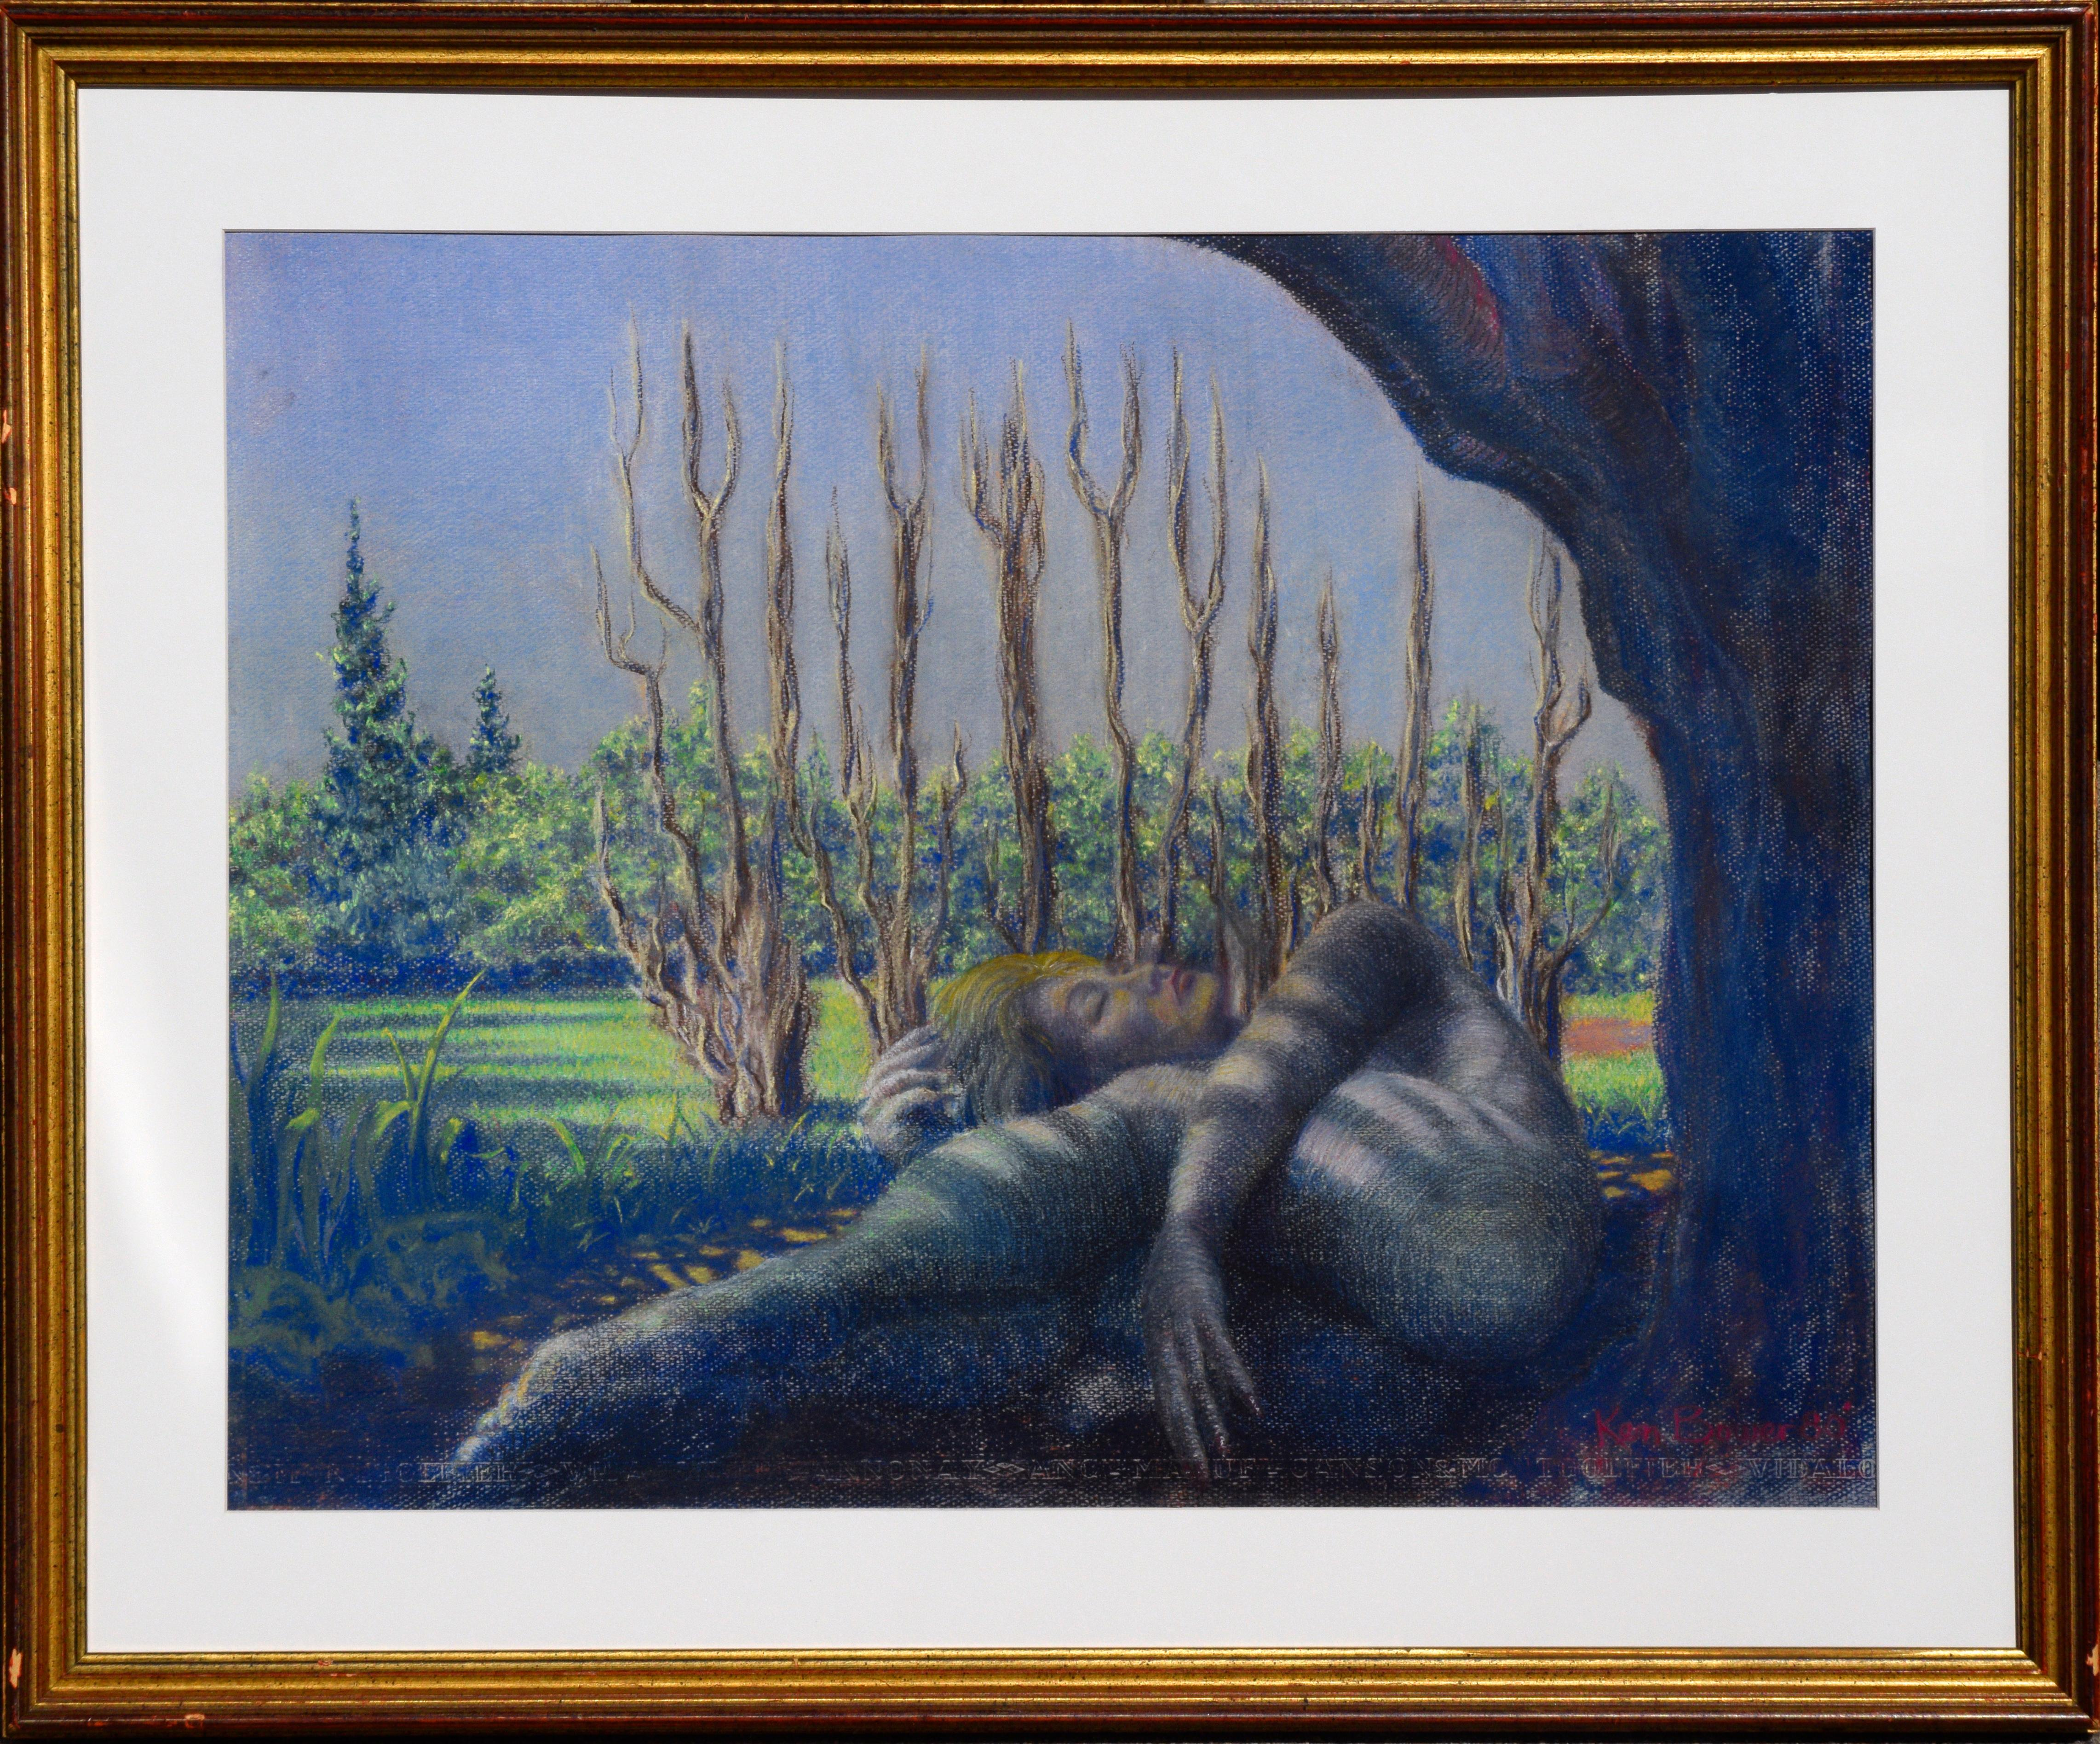 Sleeping Among the Trees -  Figurative Landscape